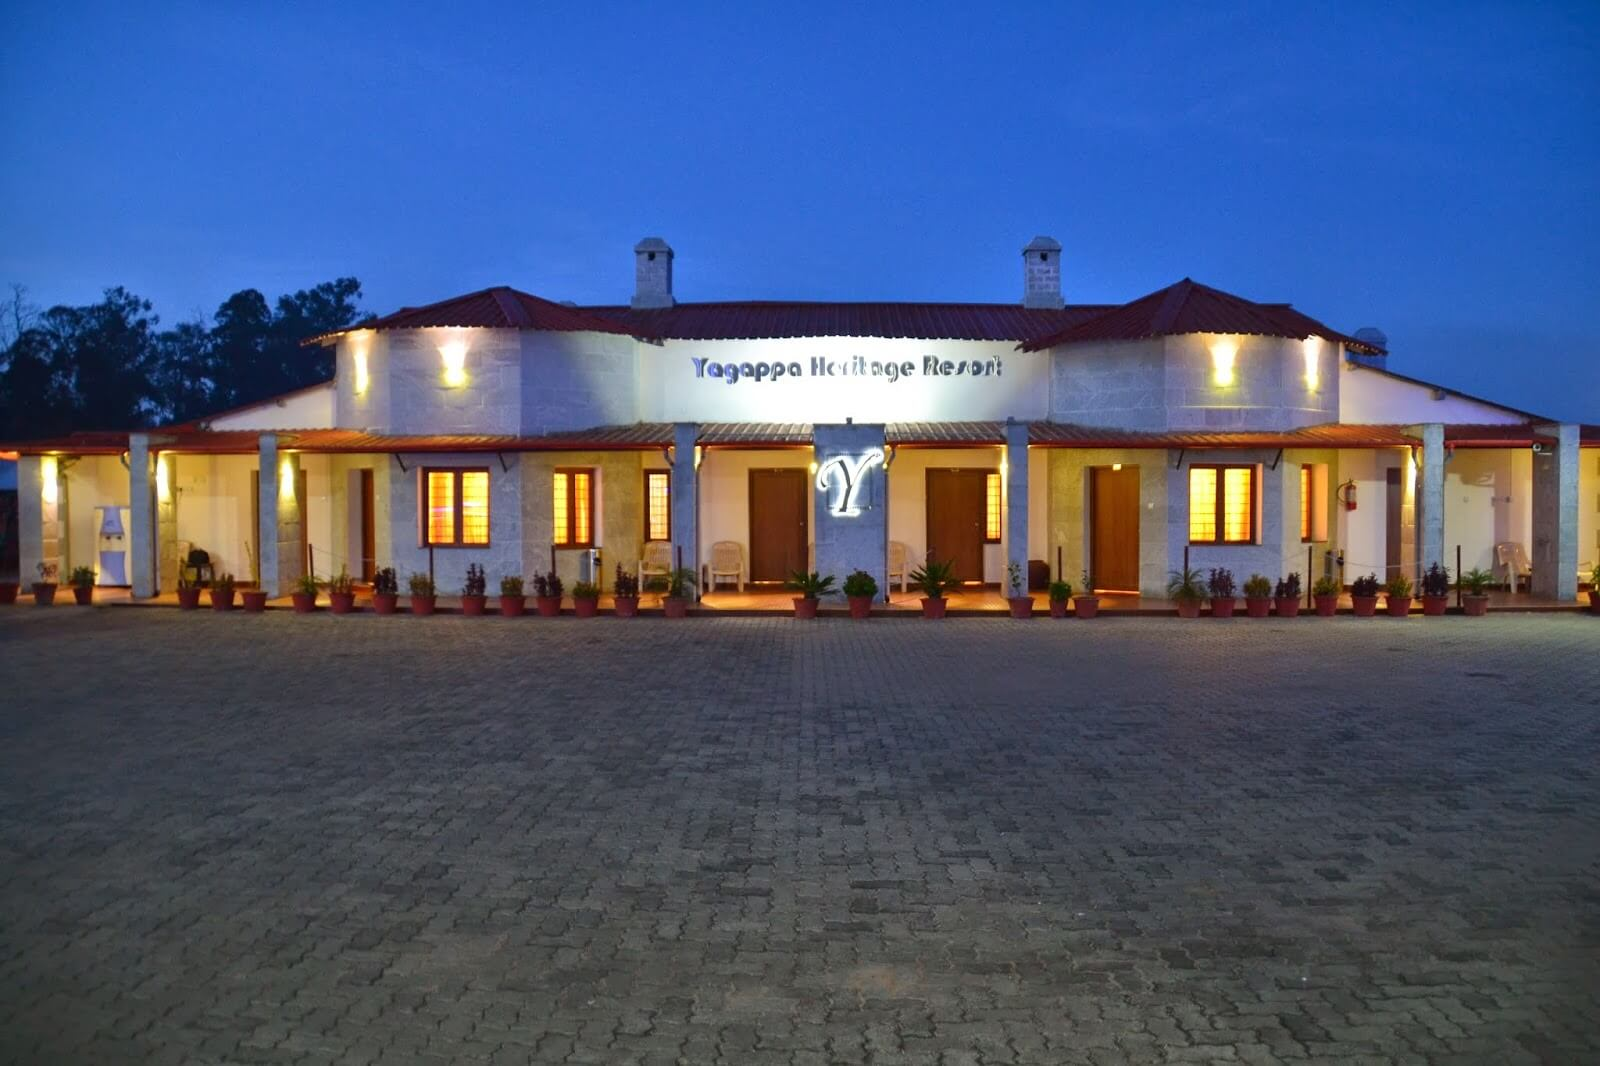 Well lit Yagappa Heritage Resort at night